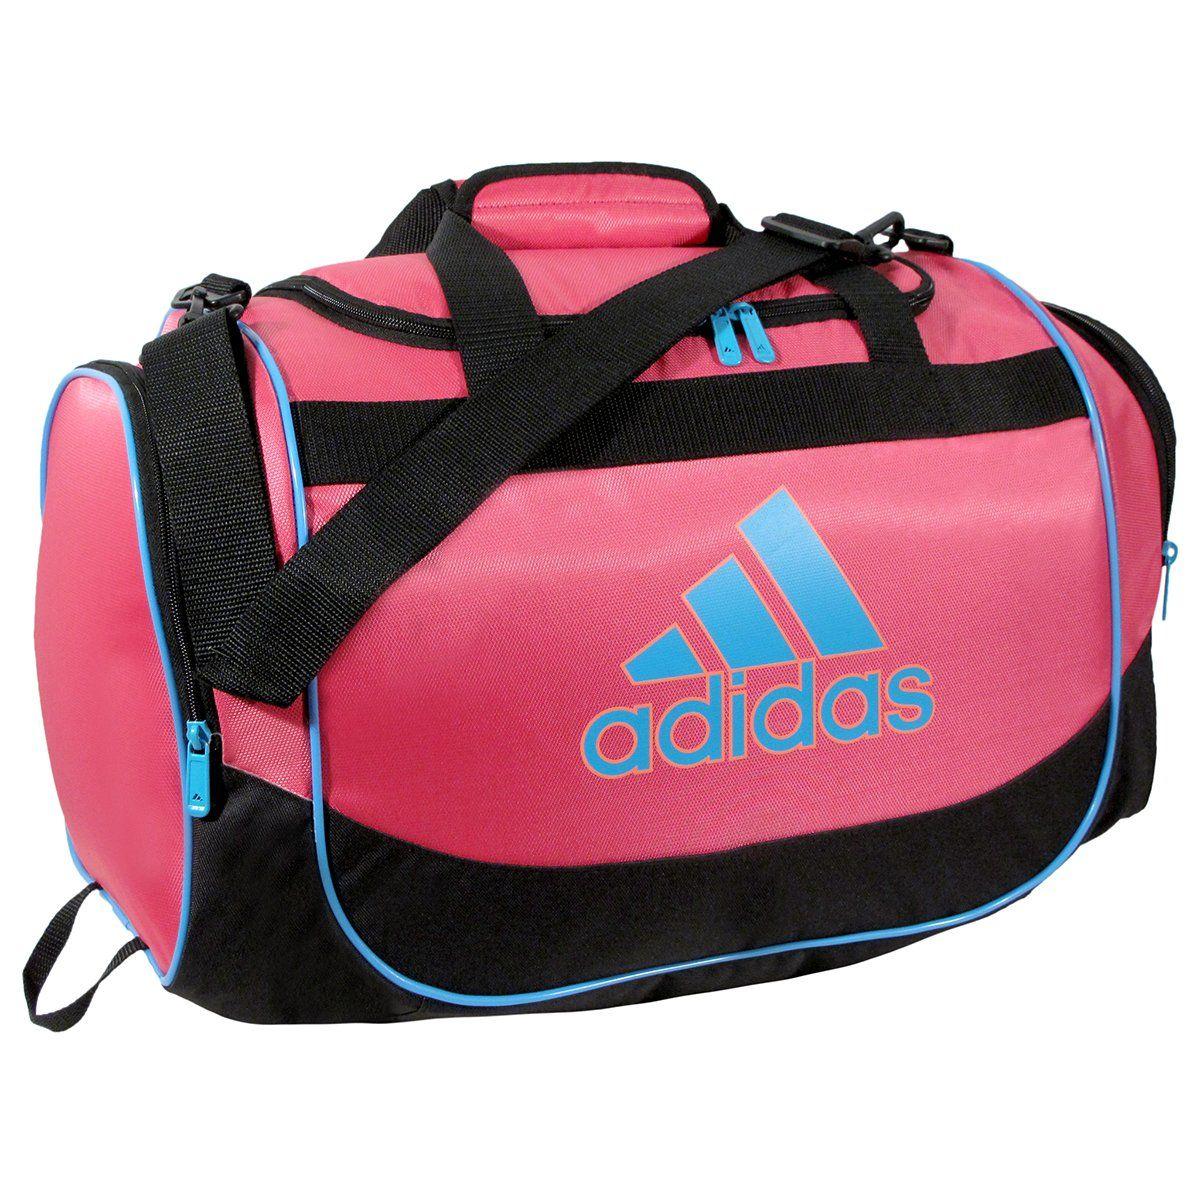 Adidas Defender Ii Small Duffel Bag Grey Socceressentials Small Duffle Bag Bags Adidas Duffle Bag